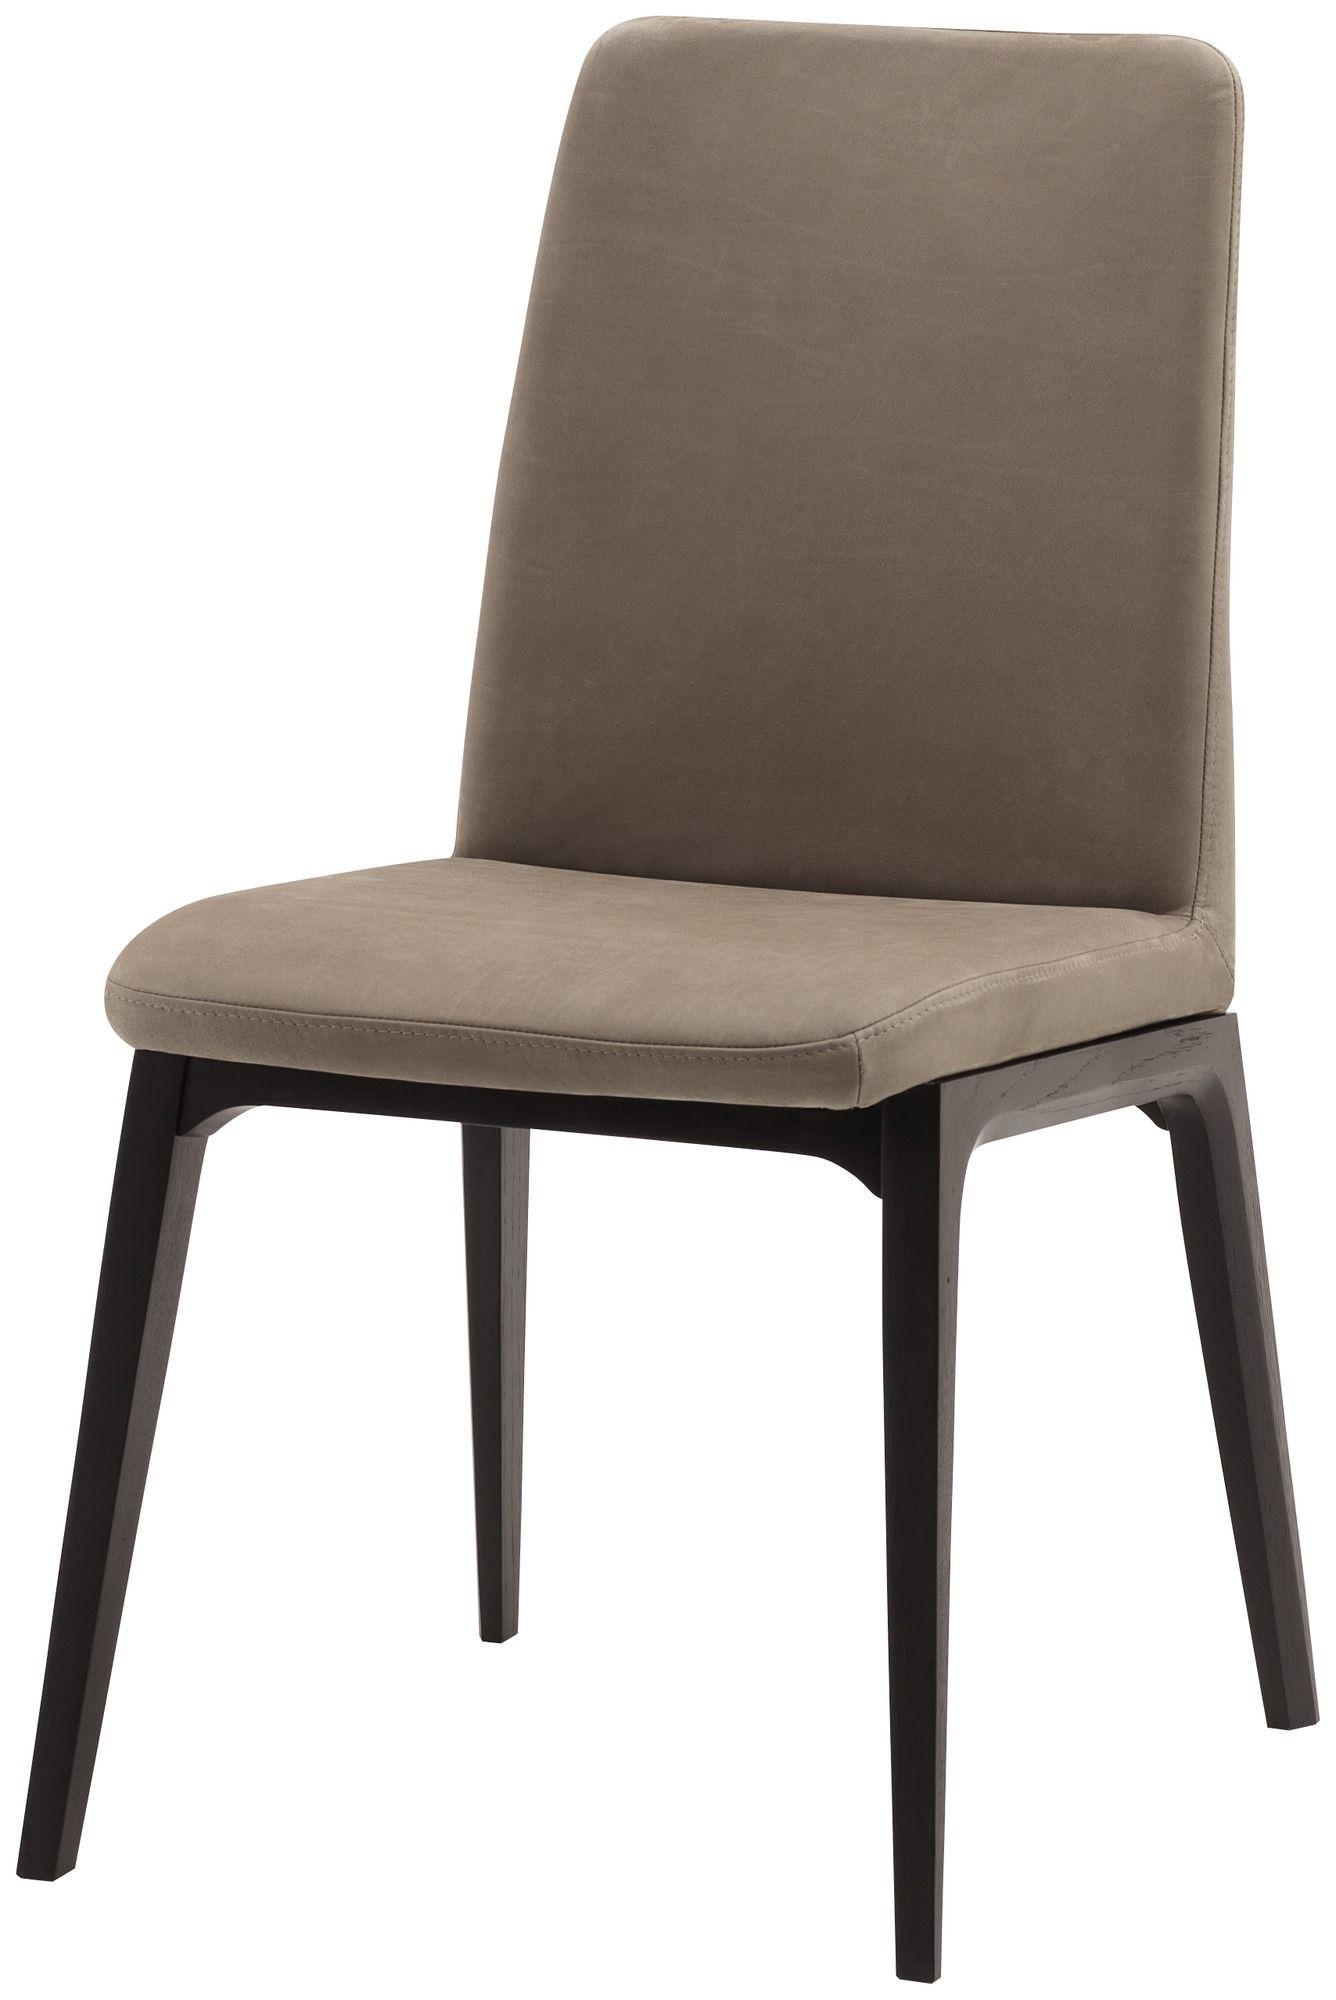 Sillas de comedor boconcept furniture sillas comedor for Silla de proposito comedor